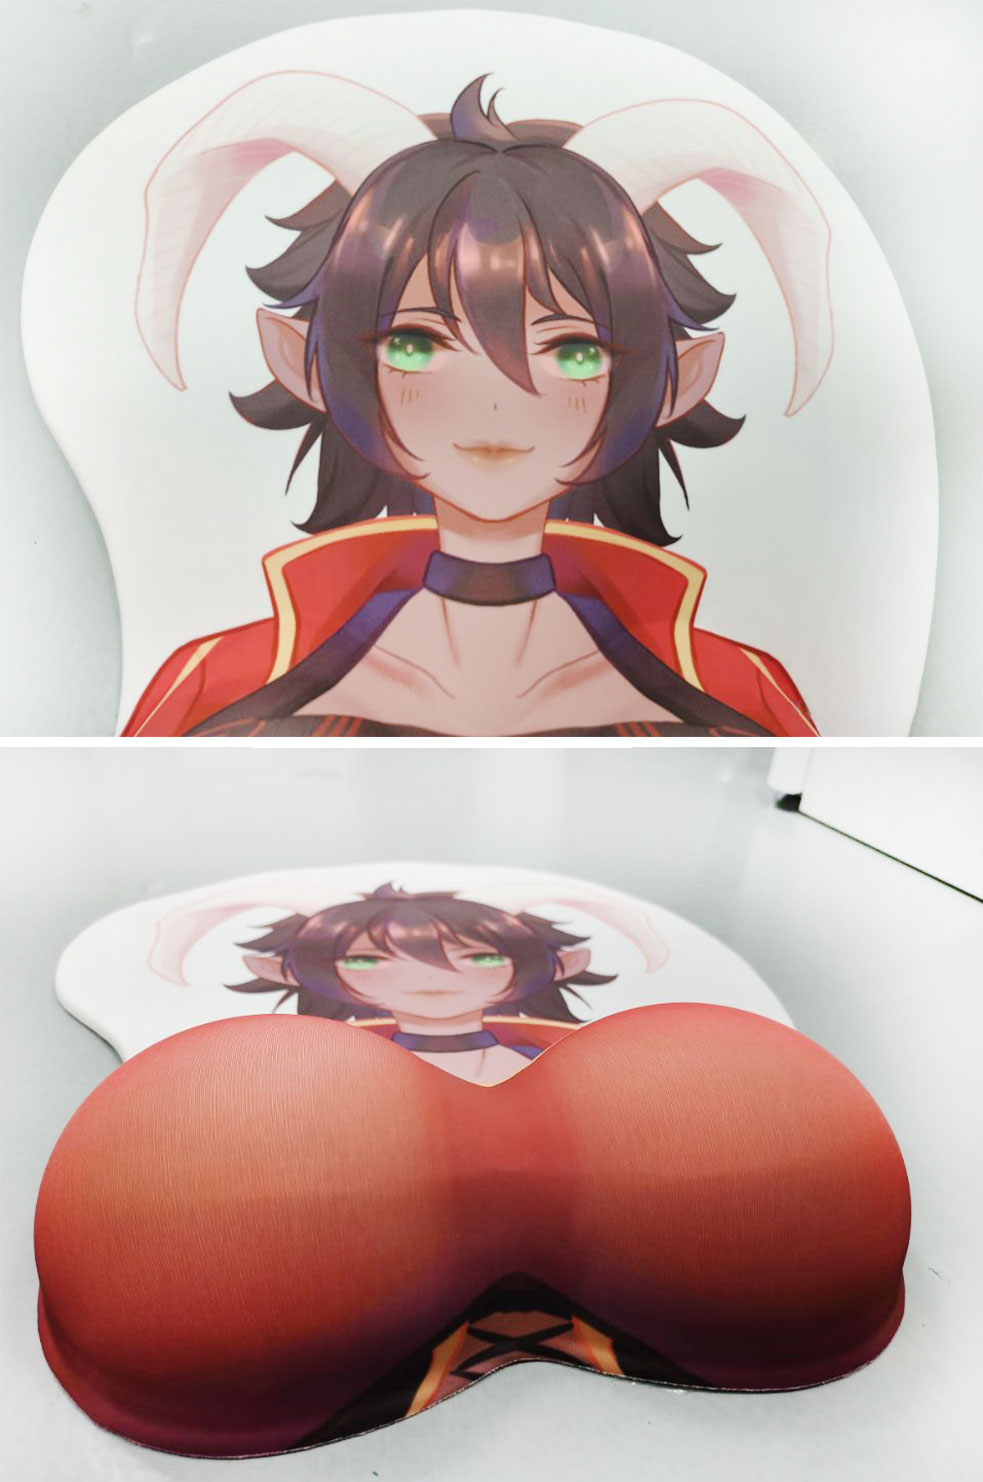 mona life size butt mouse pad 7335 - Anime Mousepads